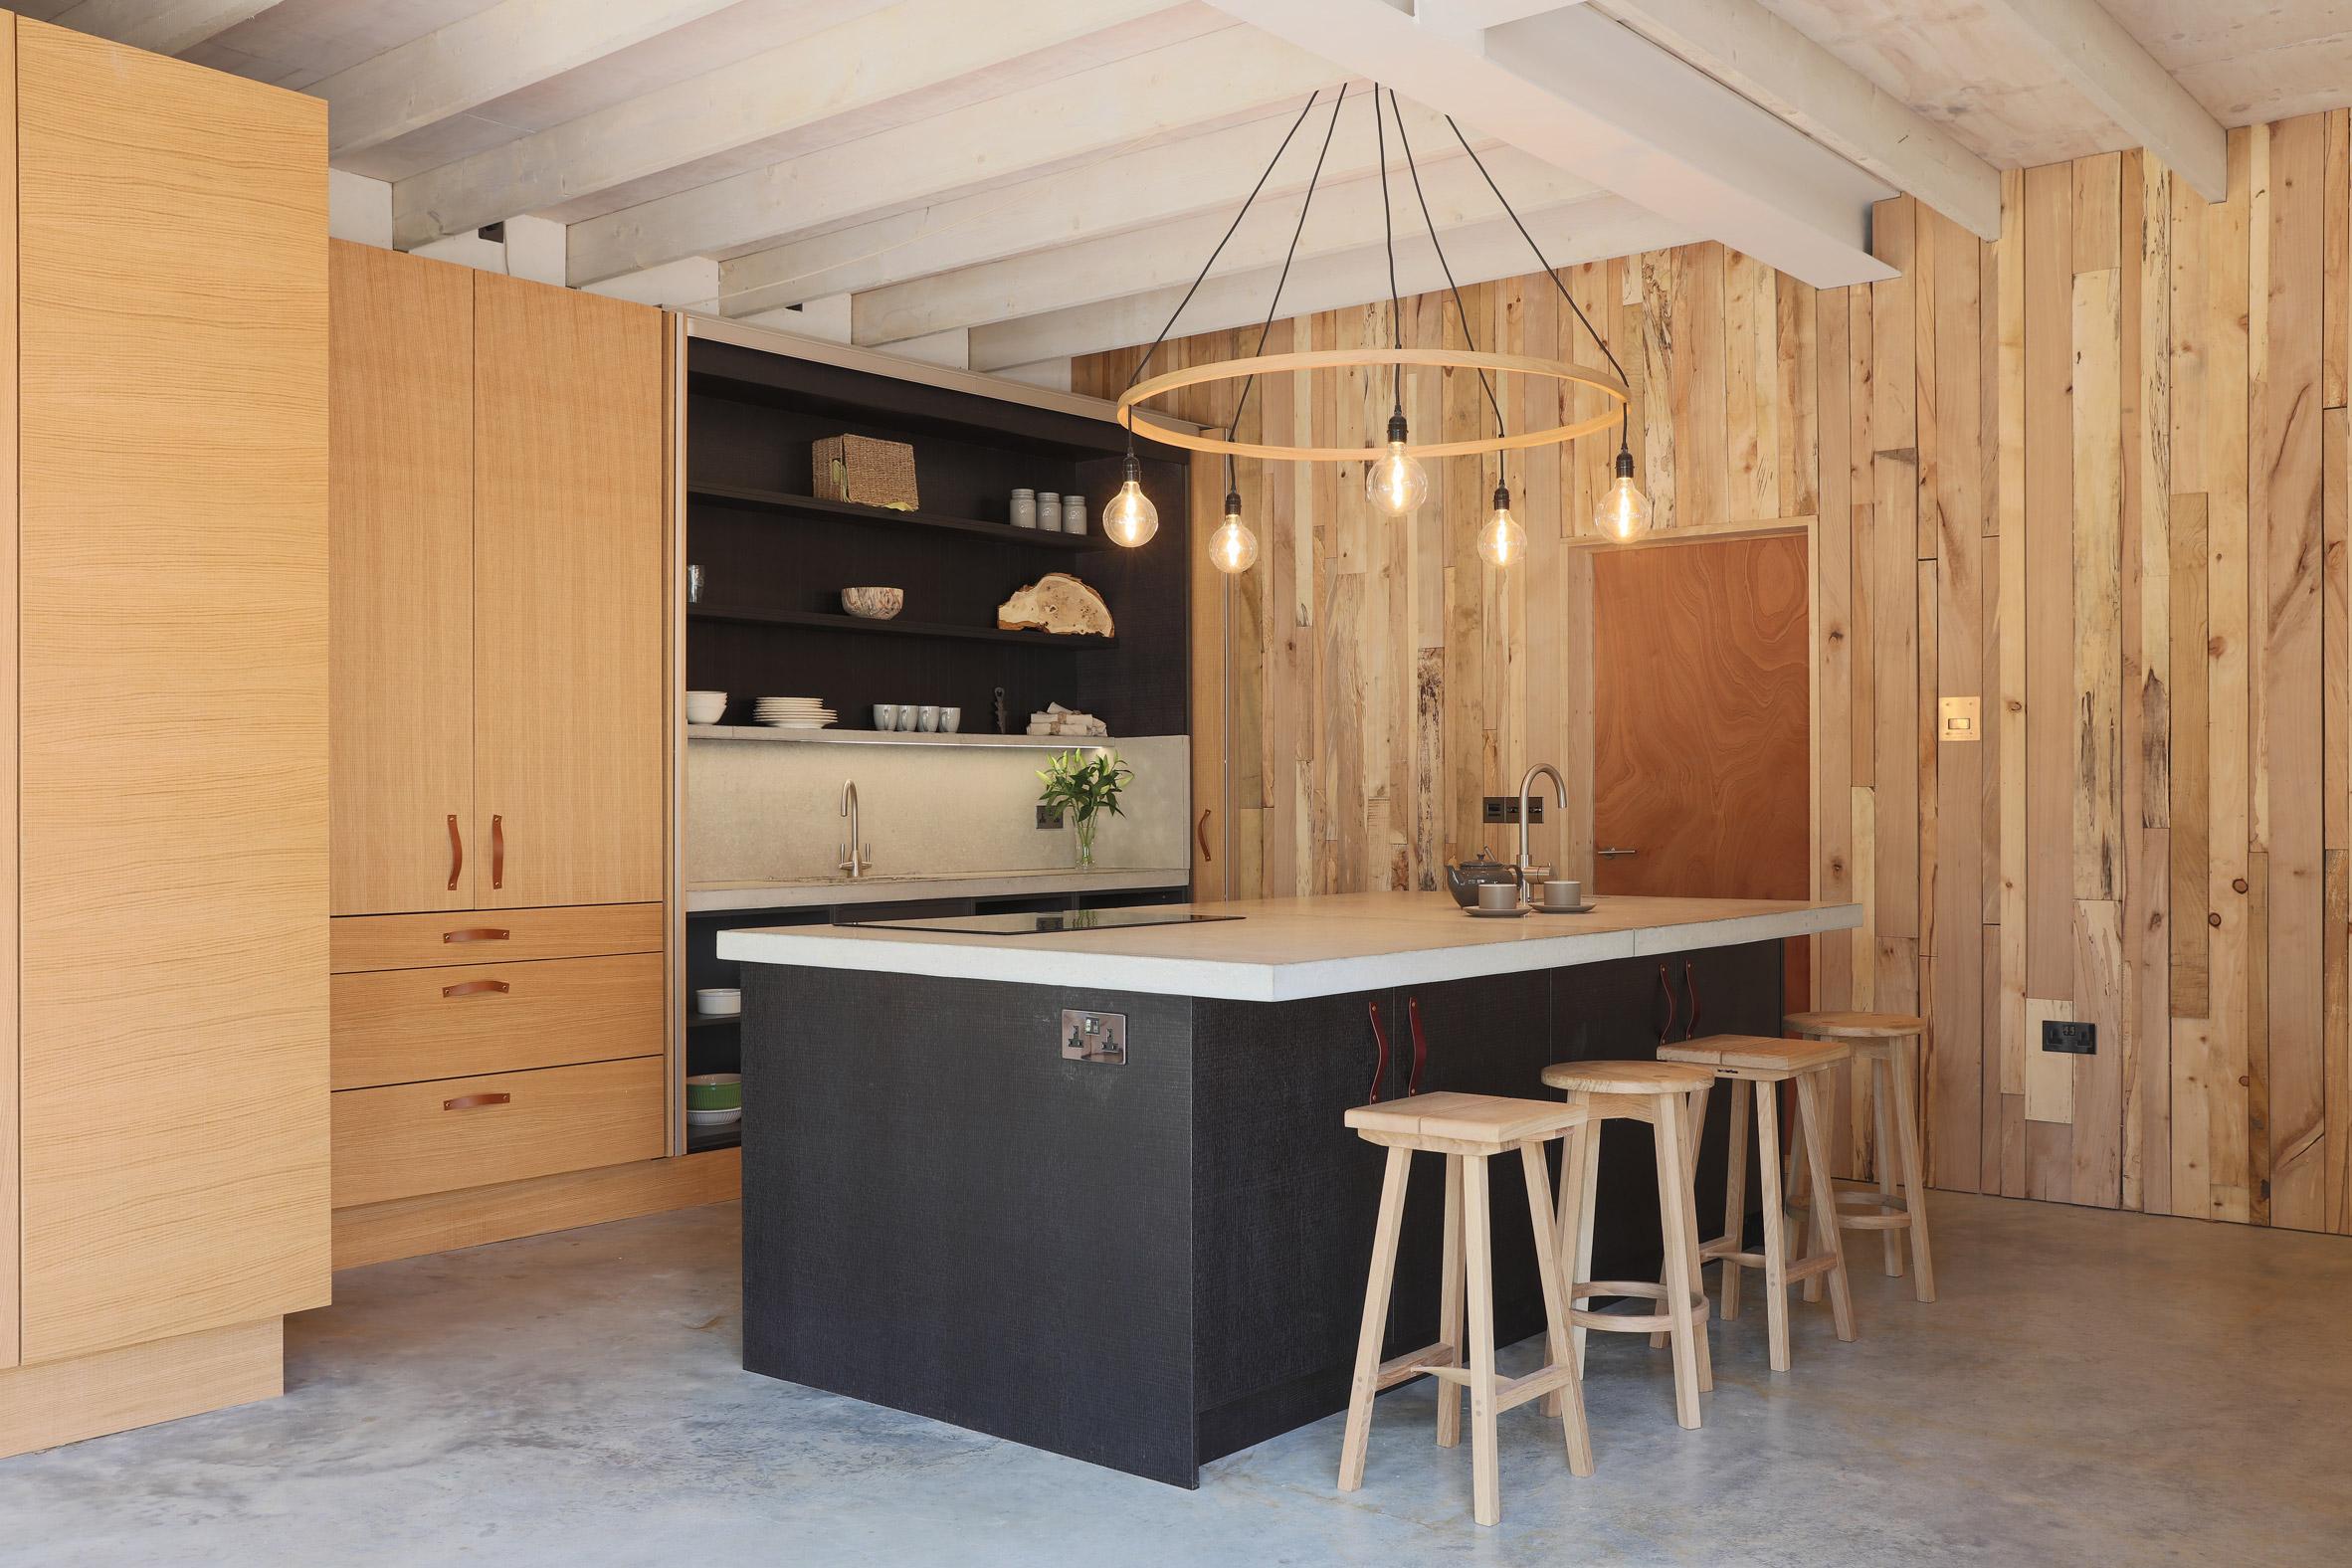 steam-bent-house-tom-raffield-architecture-residential_dezeen_2364_col_7.jpg